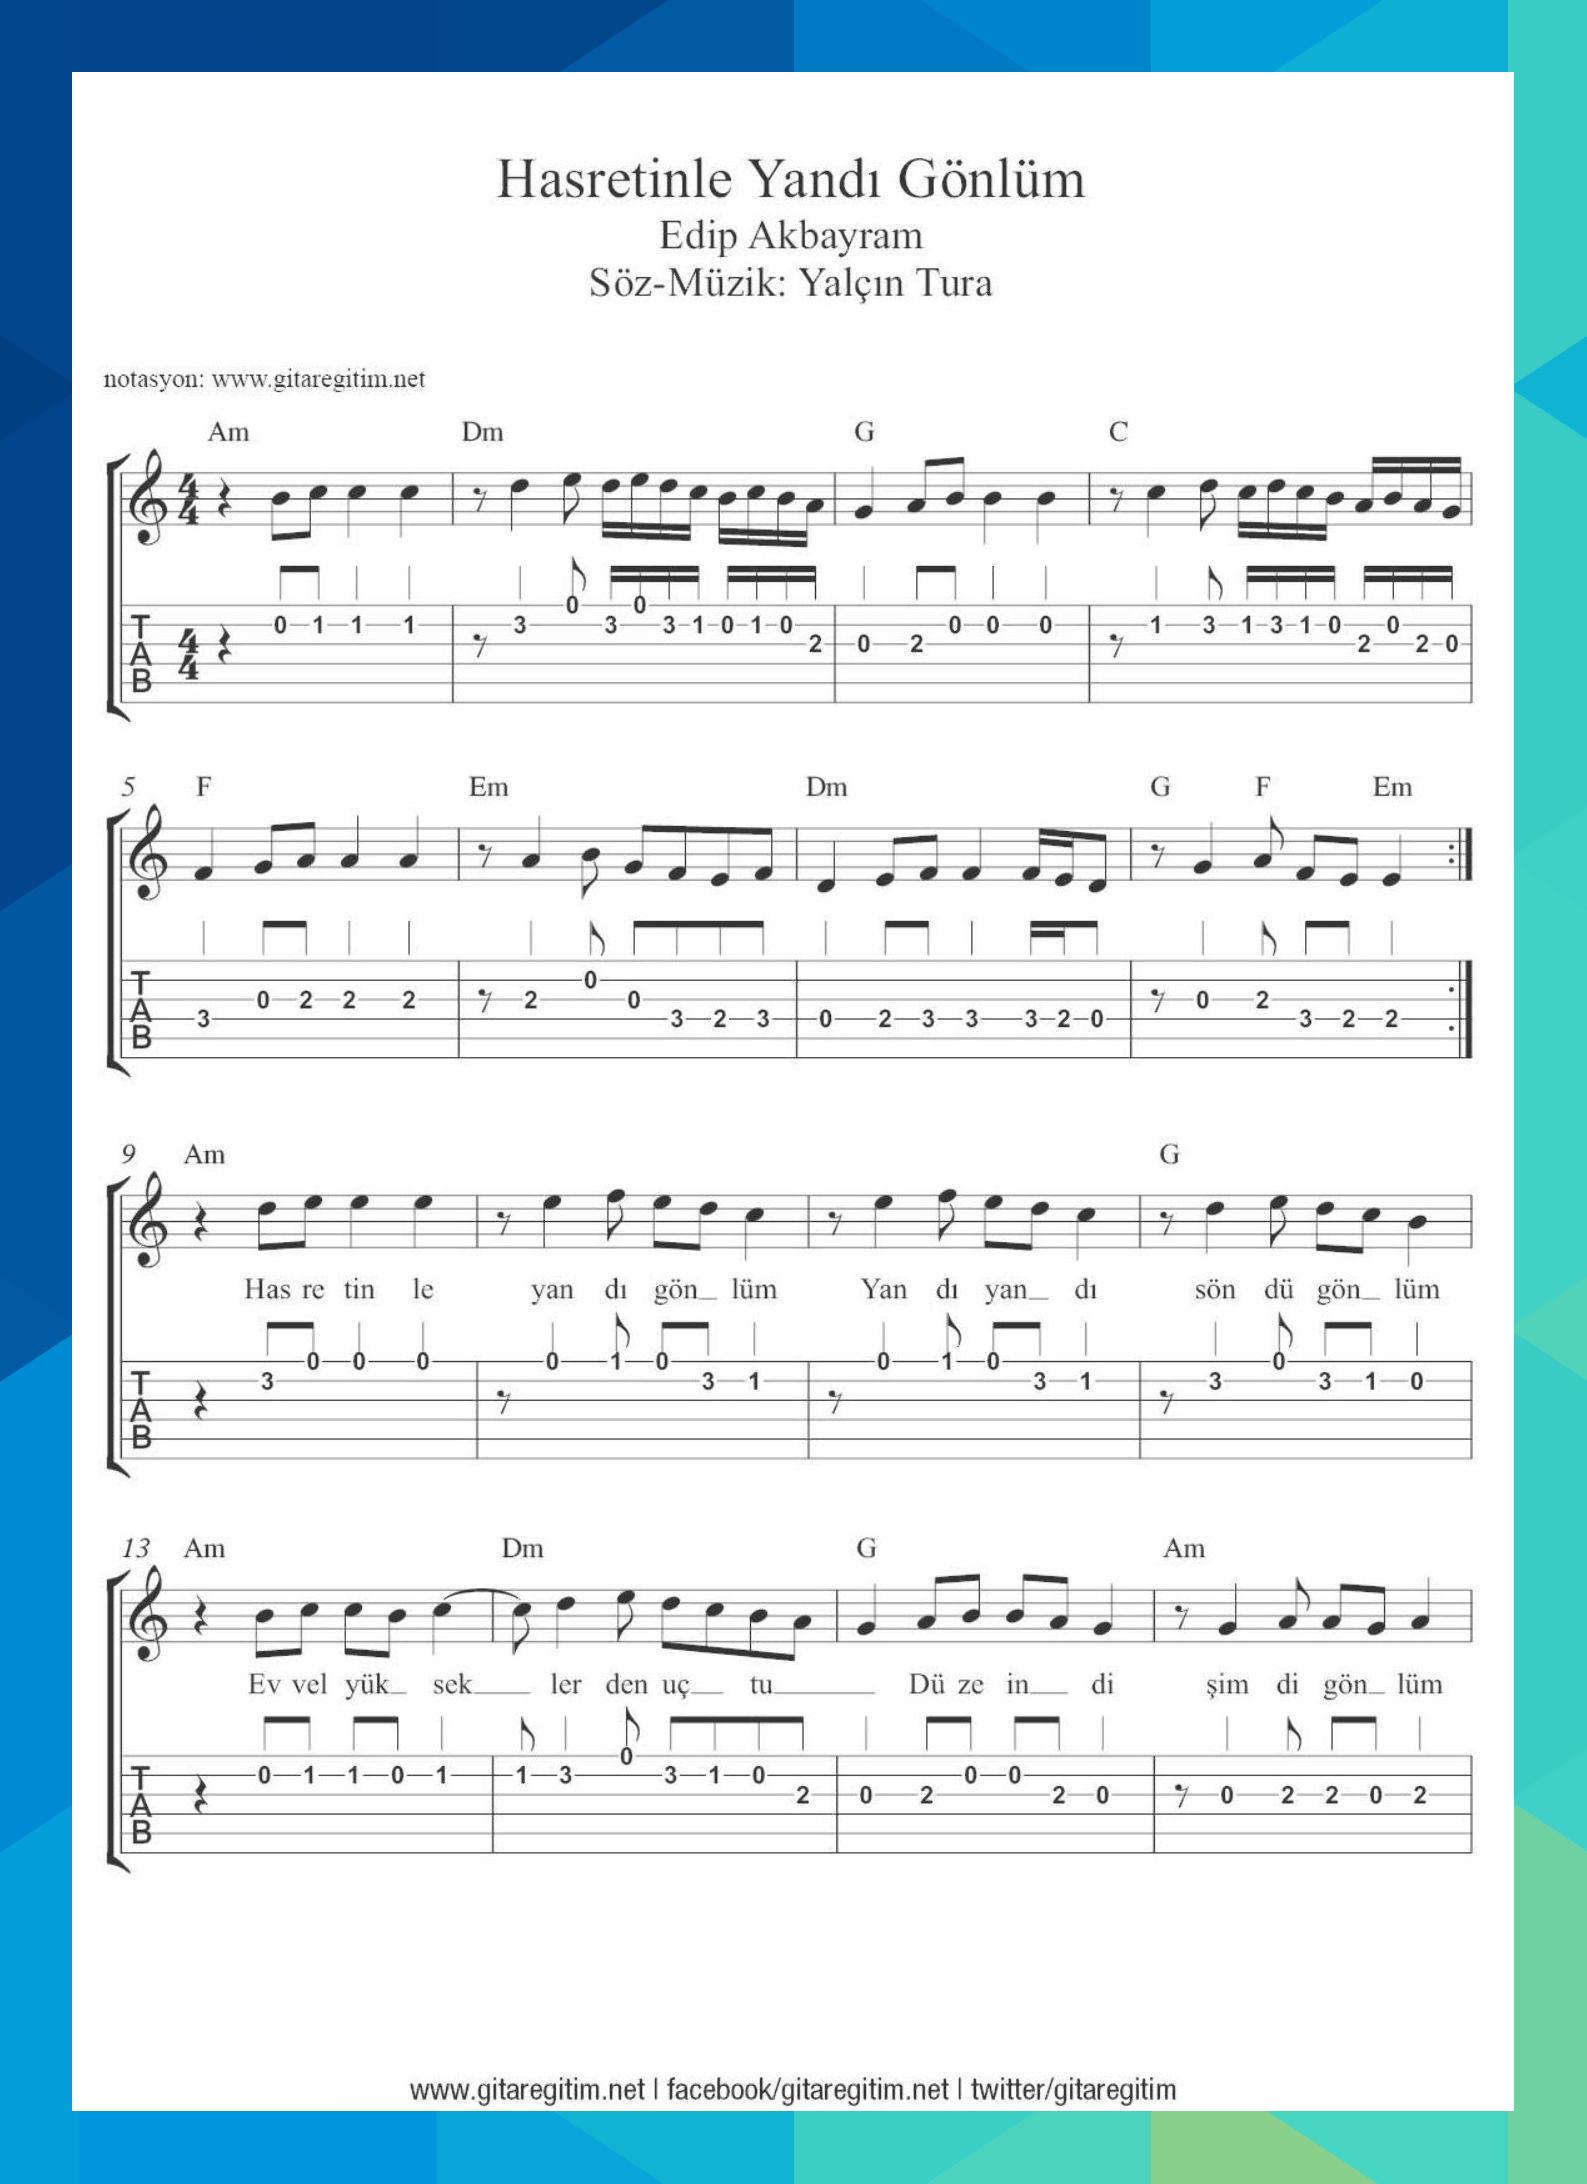 Hasretinle Yandi Gonlum Nota Tab Akor Xwisoky311 Music